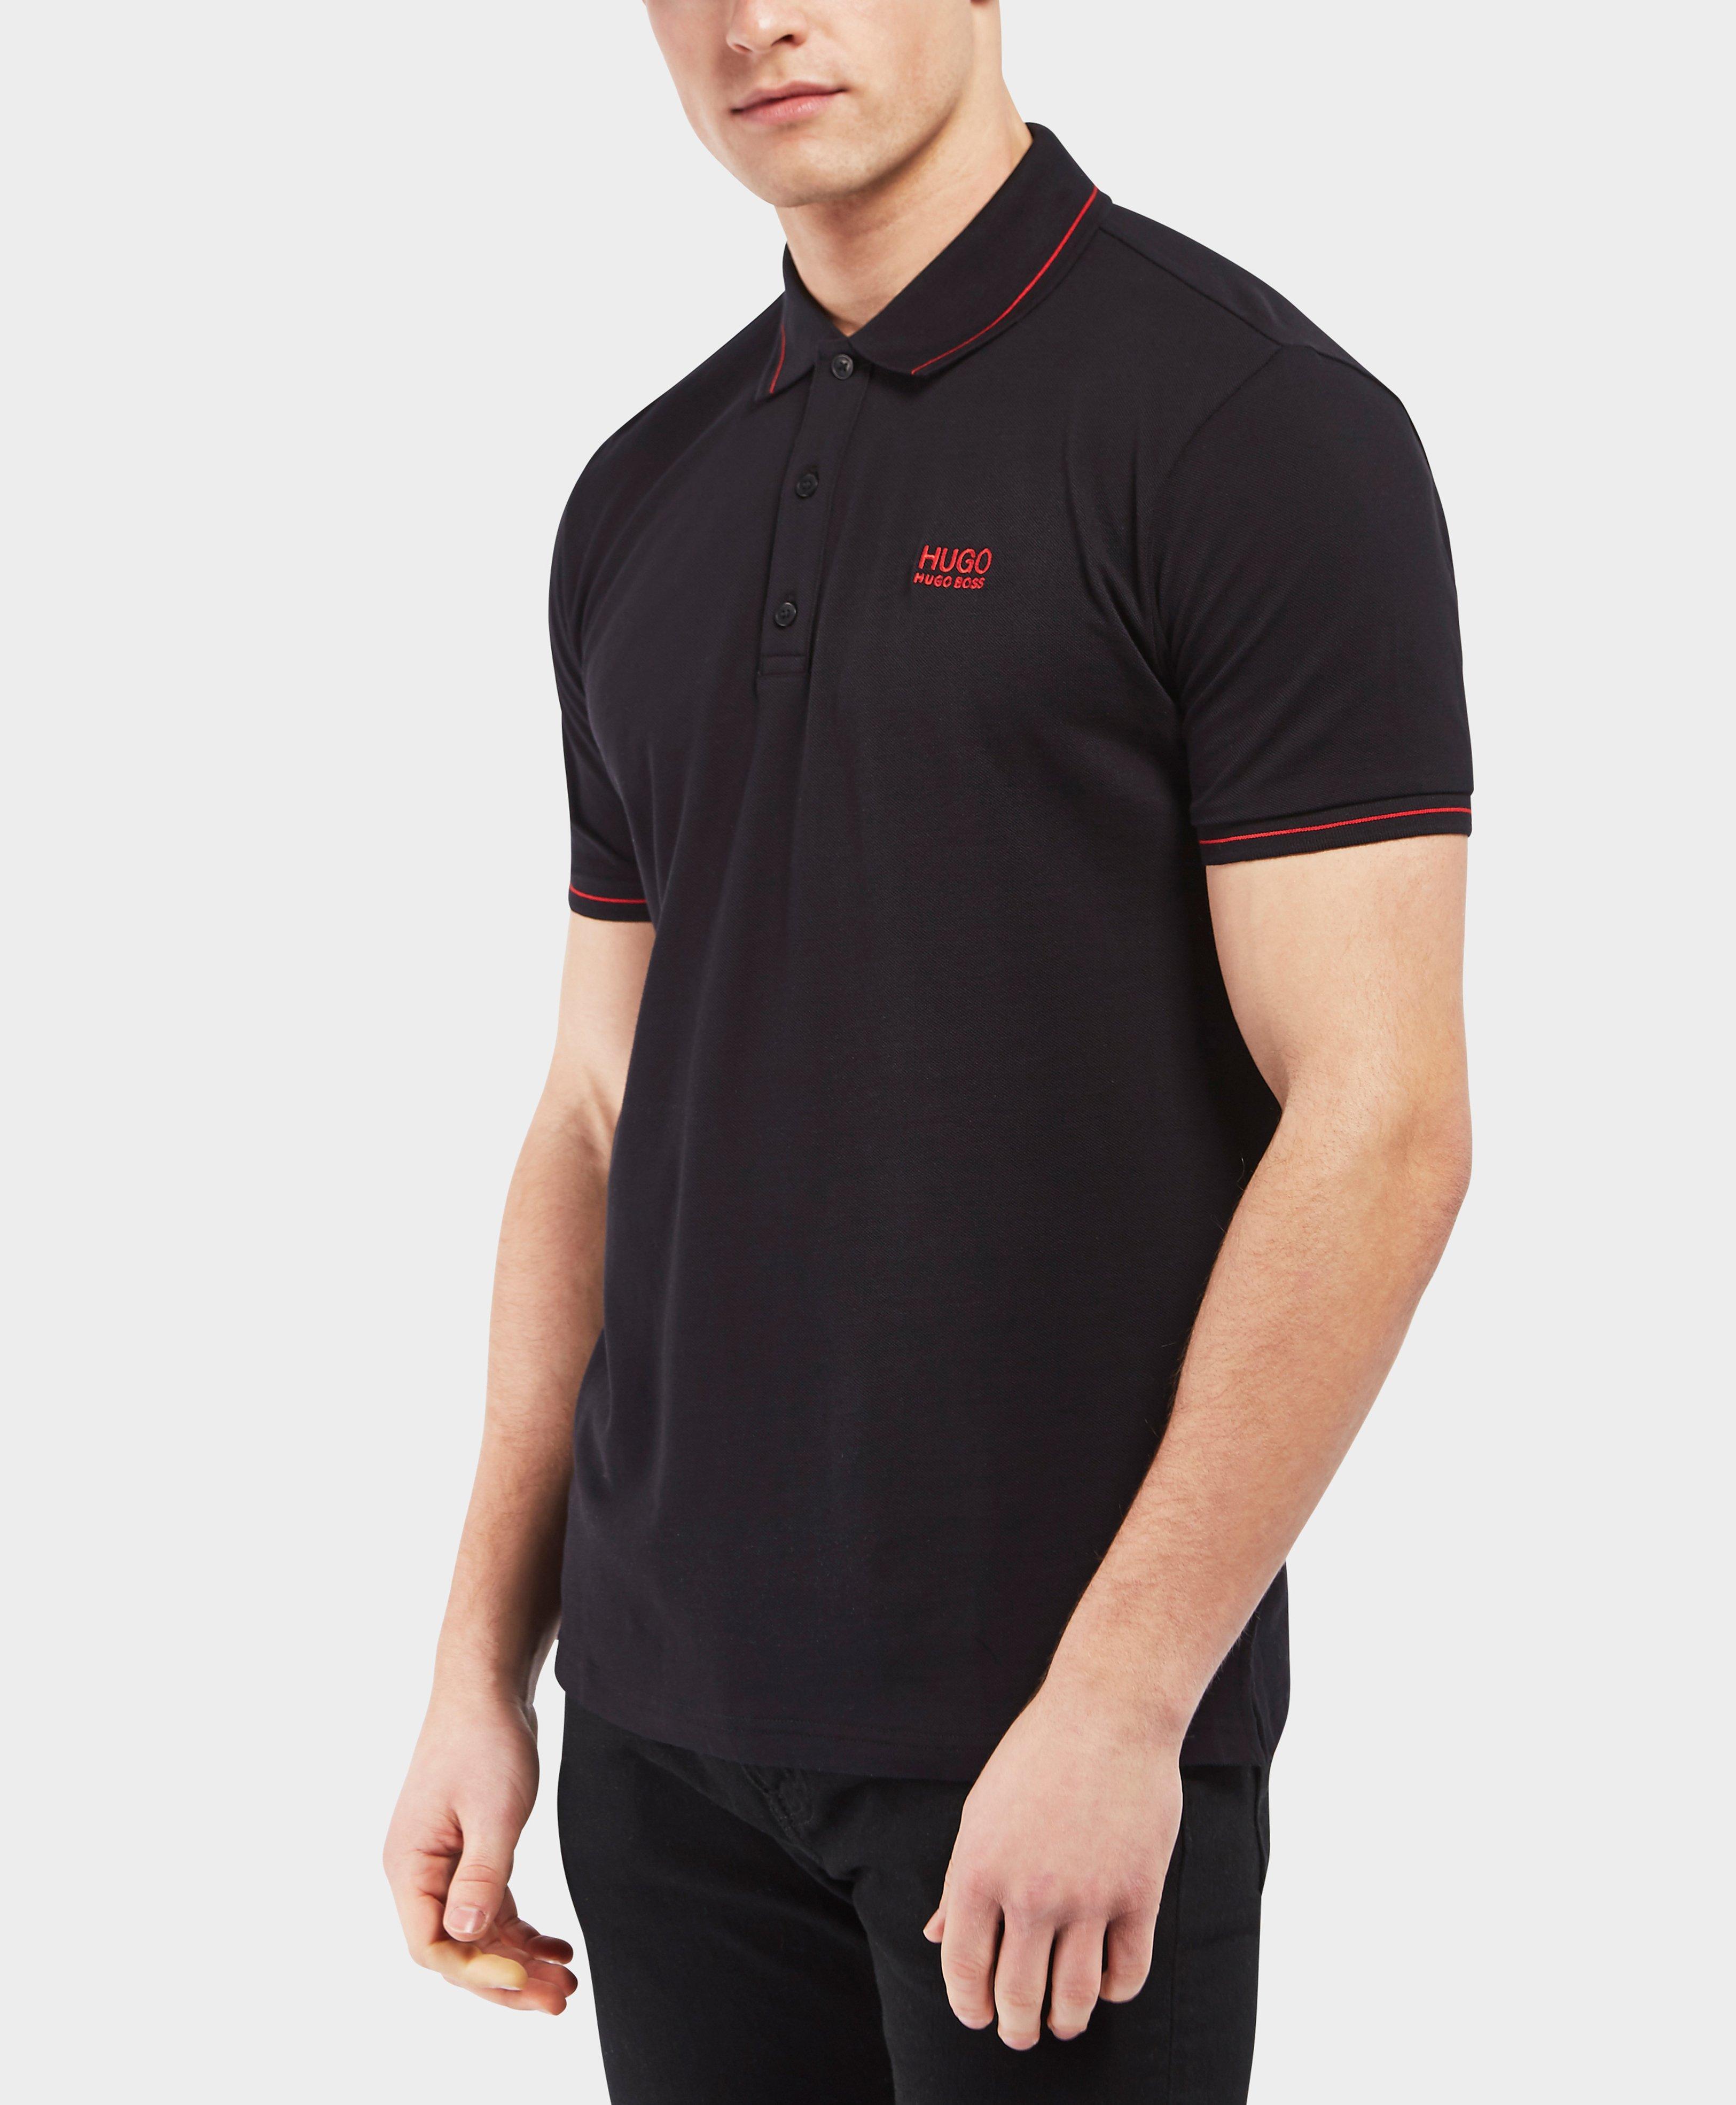 e13a5974 HUGO Daruso Short Sleeve Polo Shirt in Black for Men - Lyst